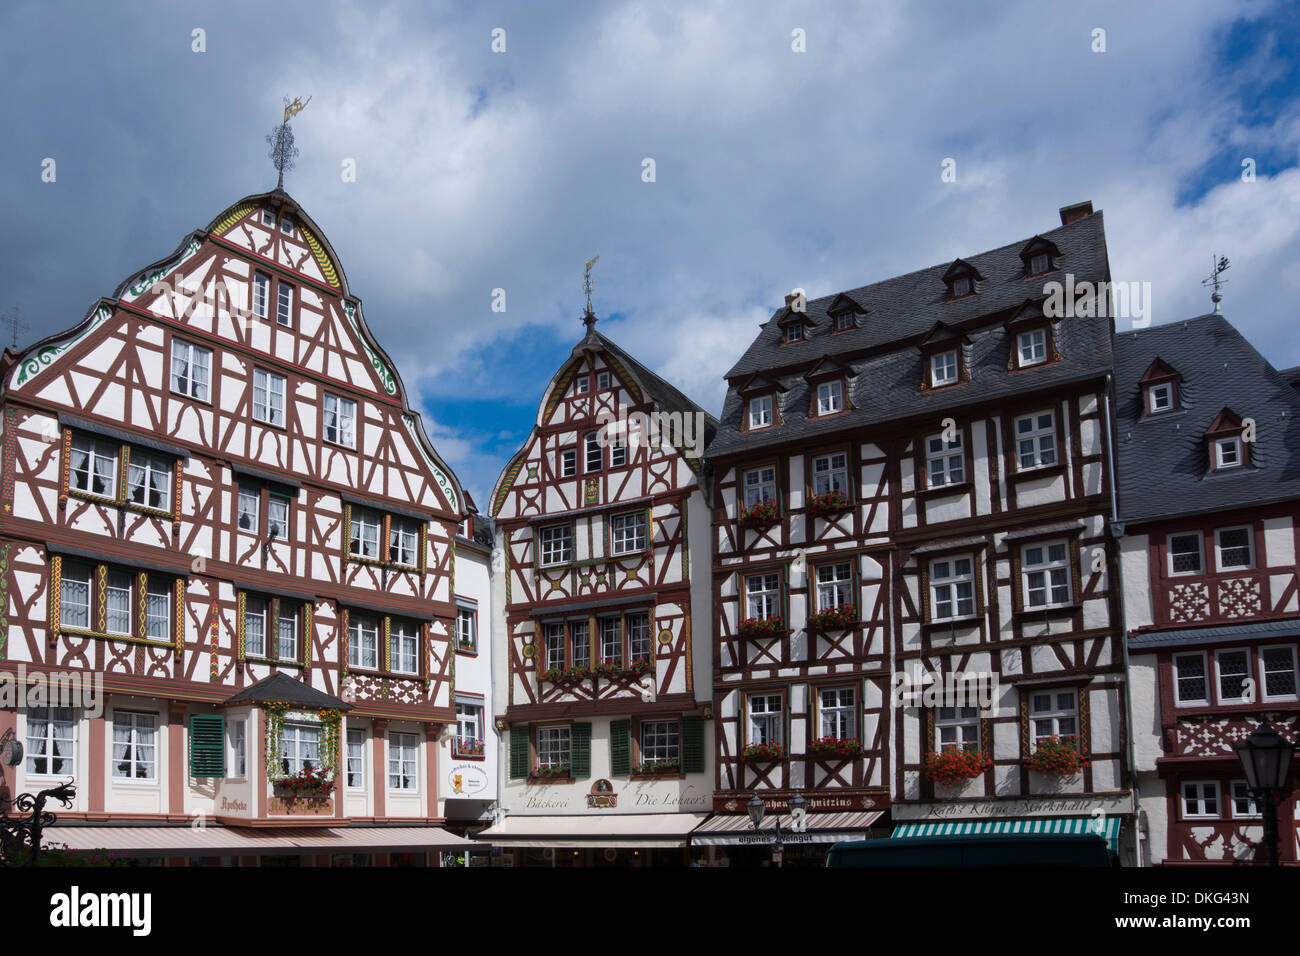 Half timbered houses at the market square in Bernkastel village, Bernkastel-Kues village, Moselle, Rhineland-Palatinate, Germany - Stock Image